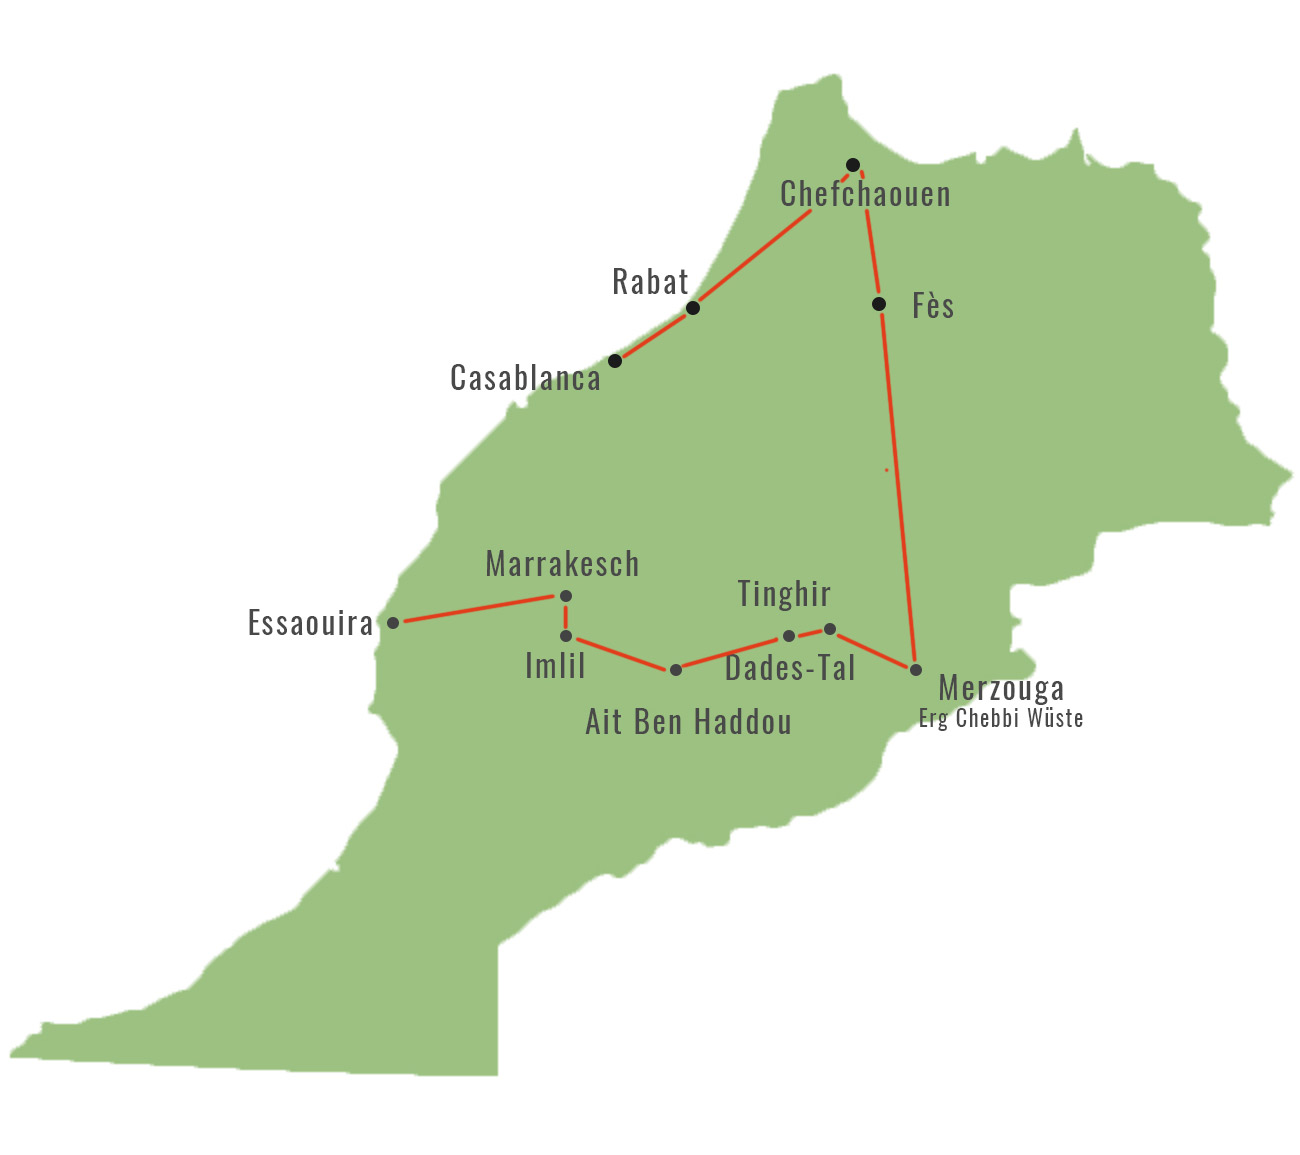 Marokko Individualreise | 2-Wochen-Reiseroute